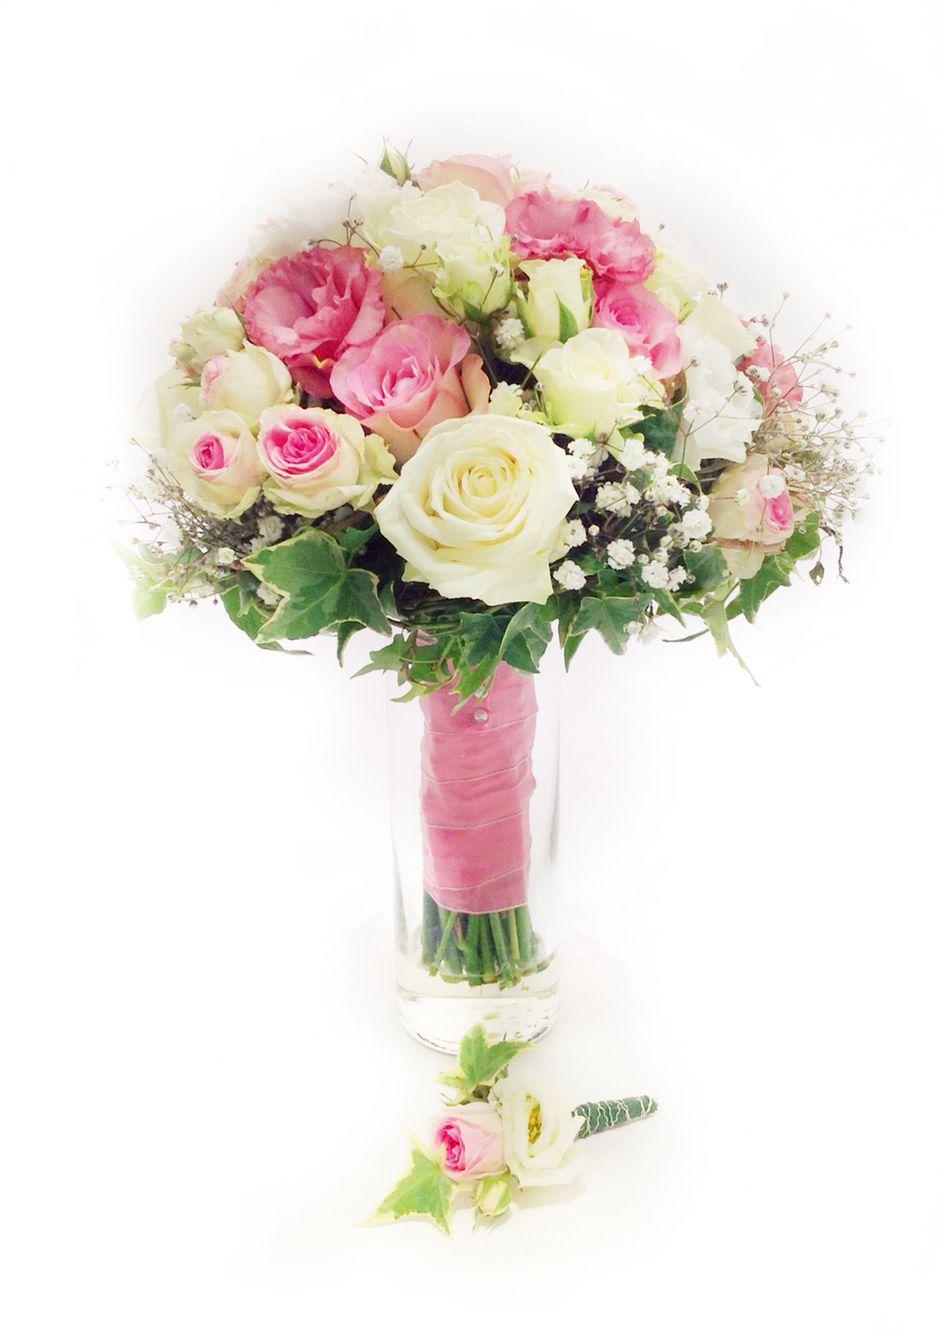 Brautstrau rosa wei mit Rosen Eustoma und Efeu